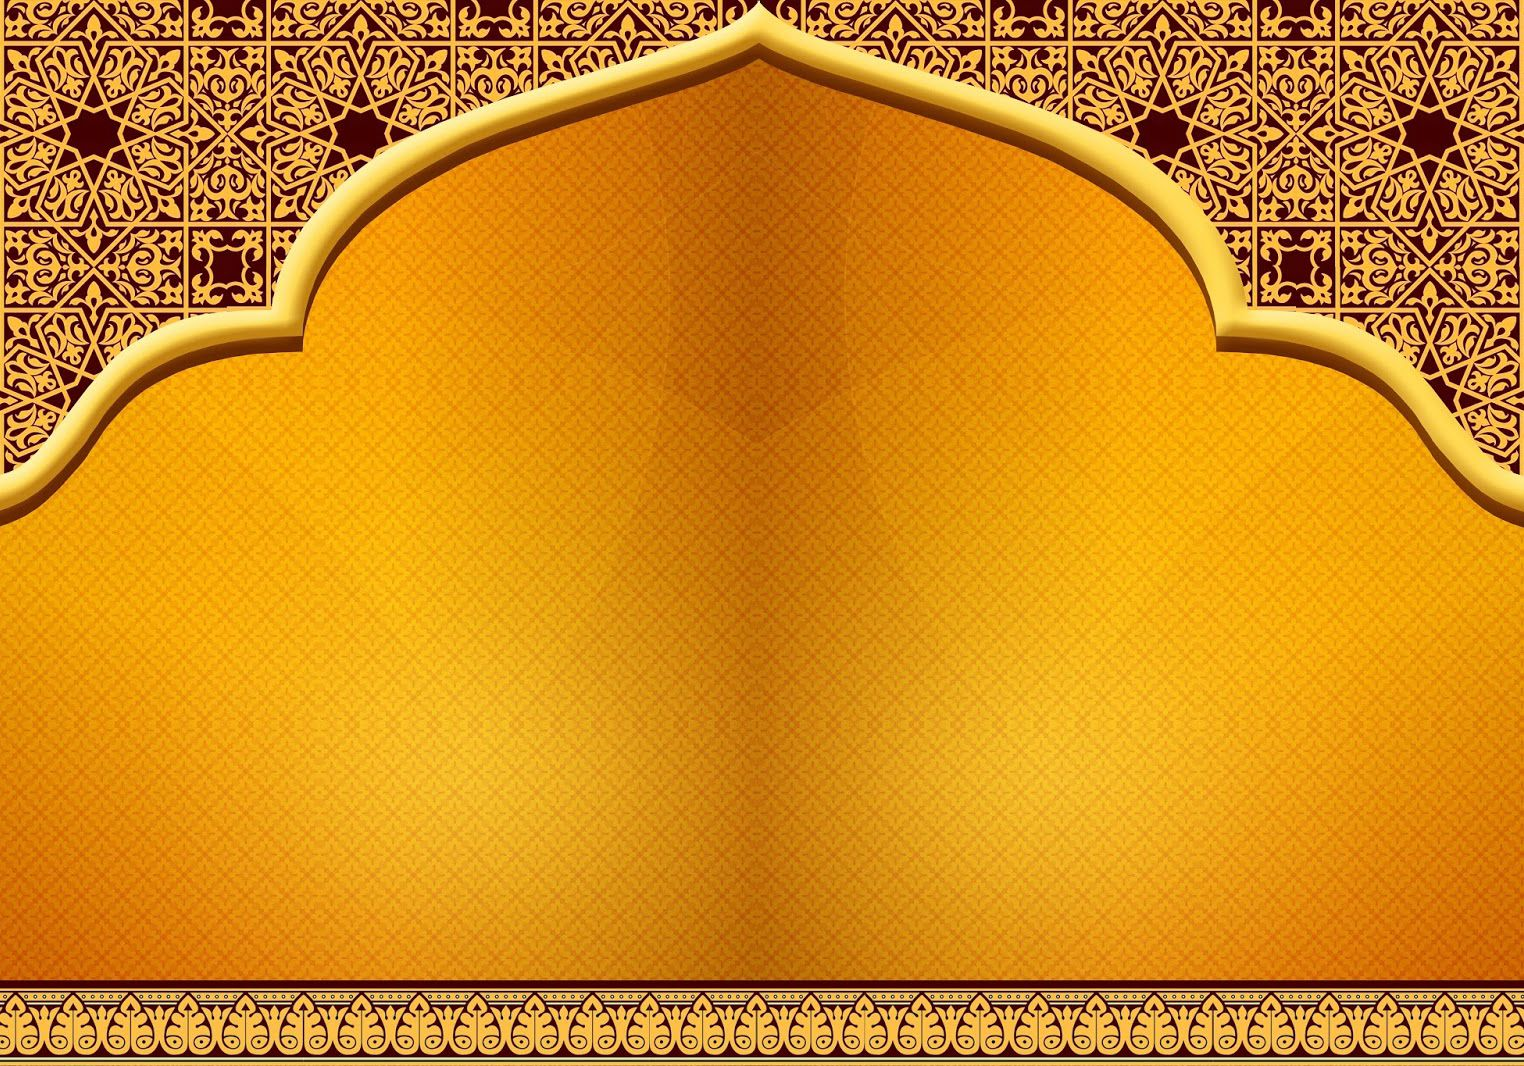 Islamic Wallpaper HD White Background In 2021   Islamic Wallpaper Hd, Orange  Design, Islamic Mosaic